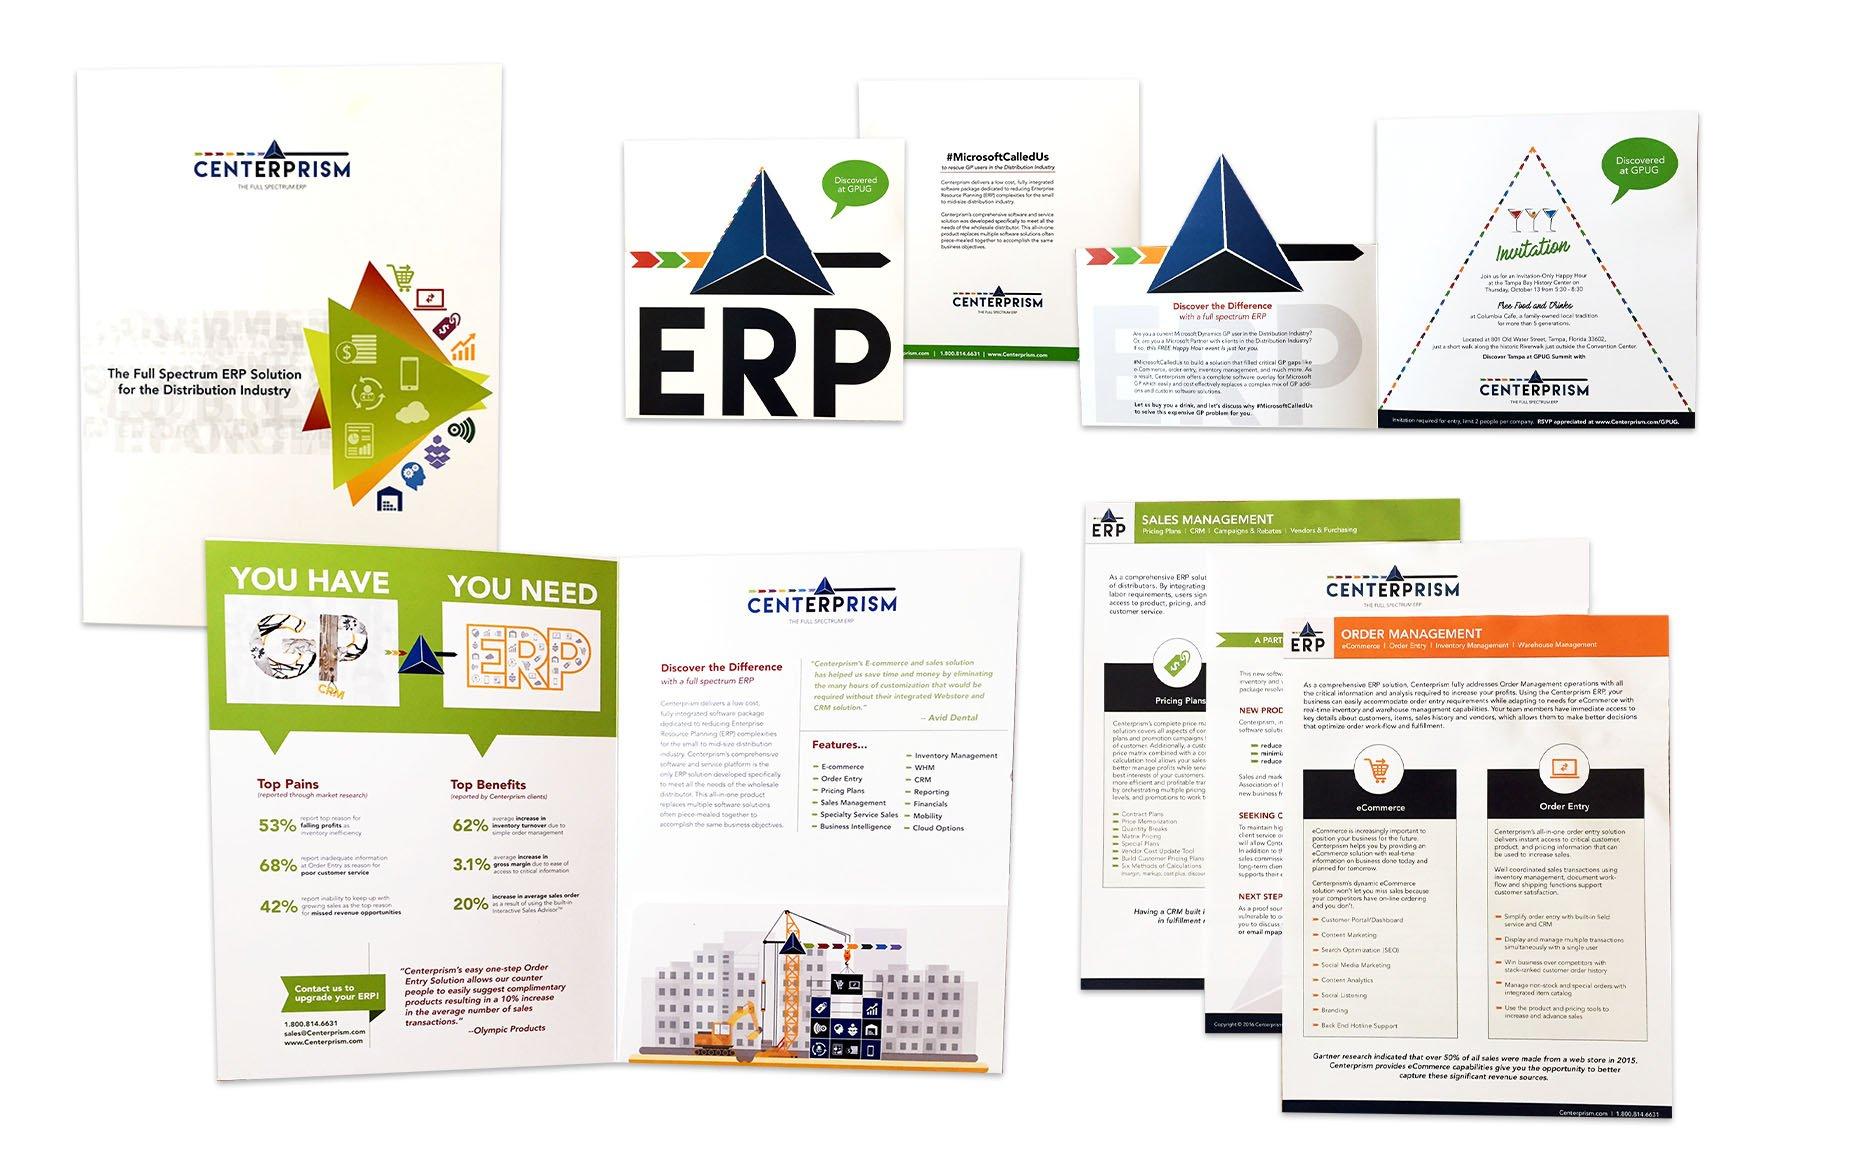 Corporate branding examples of great graphic design